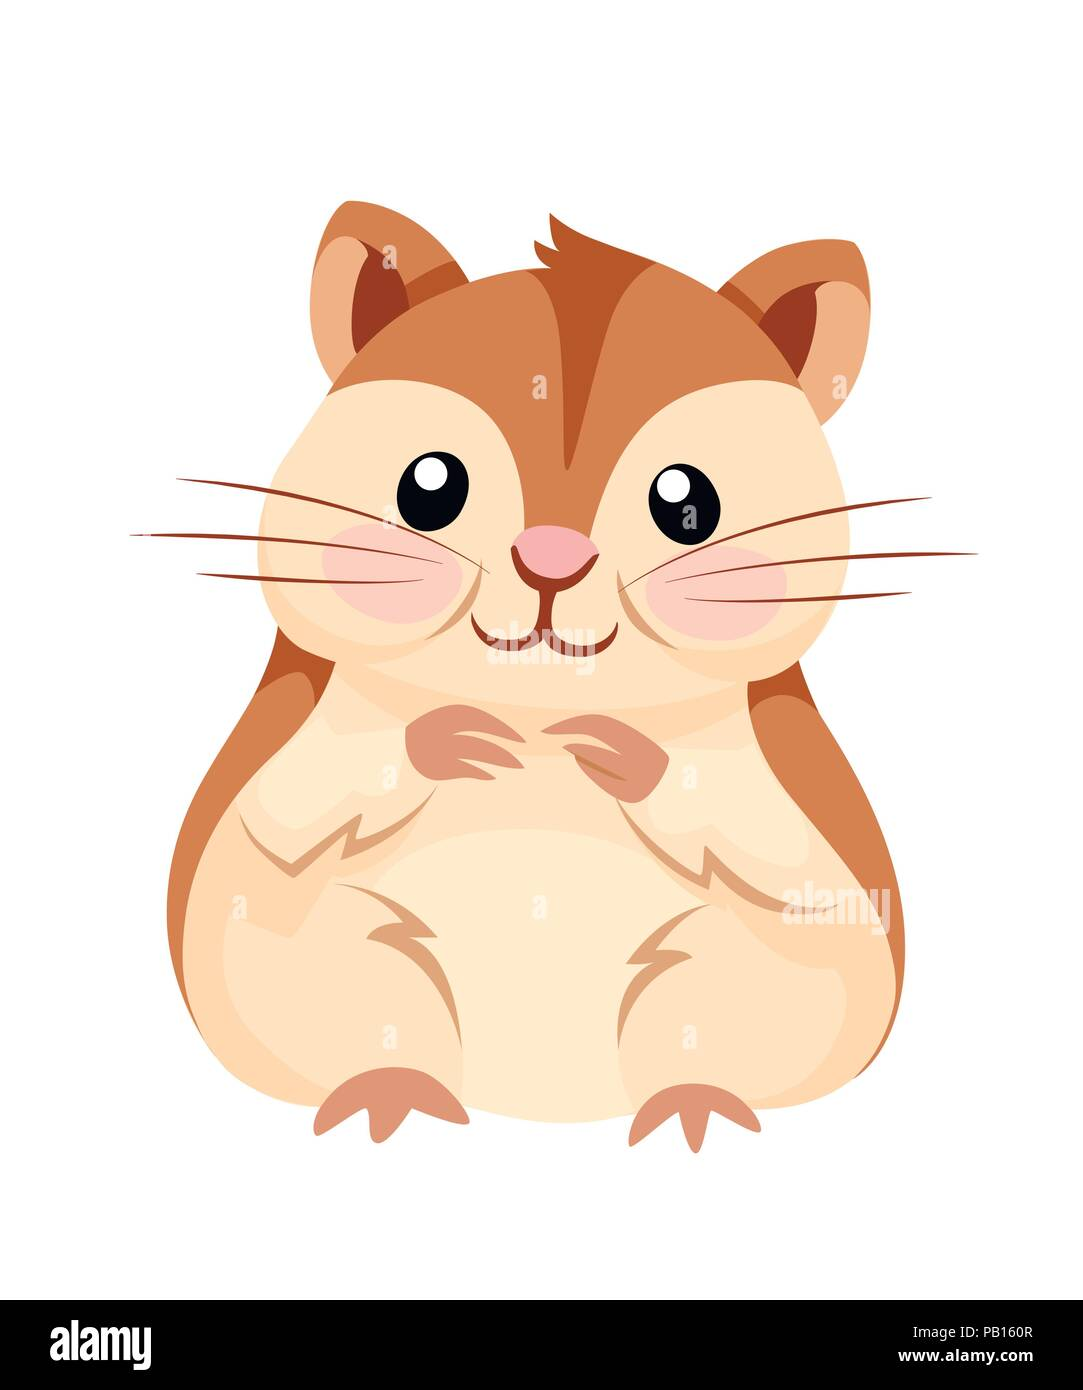 cartoon animal illustration cute hamster sit and smiling flat